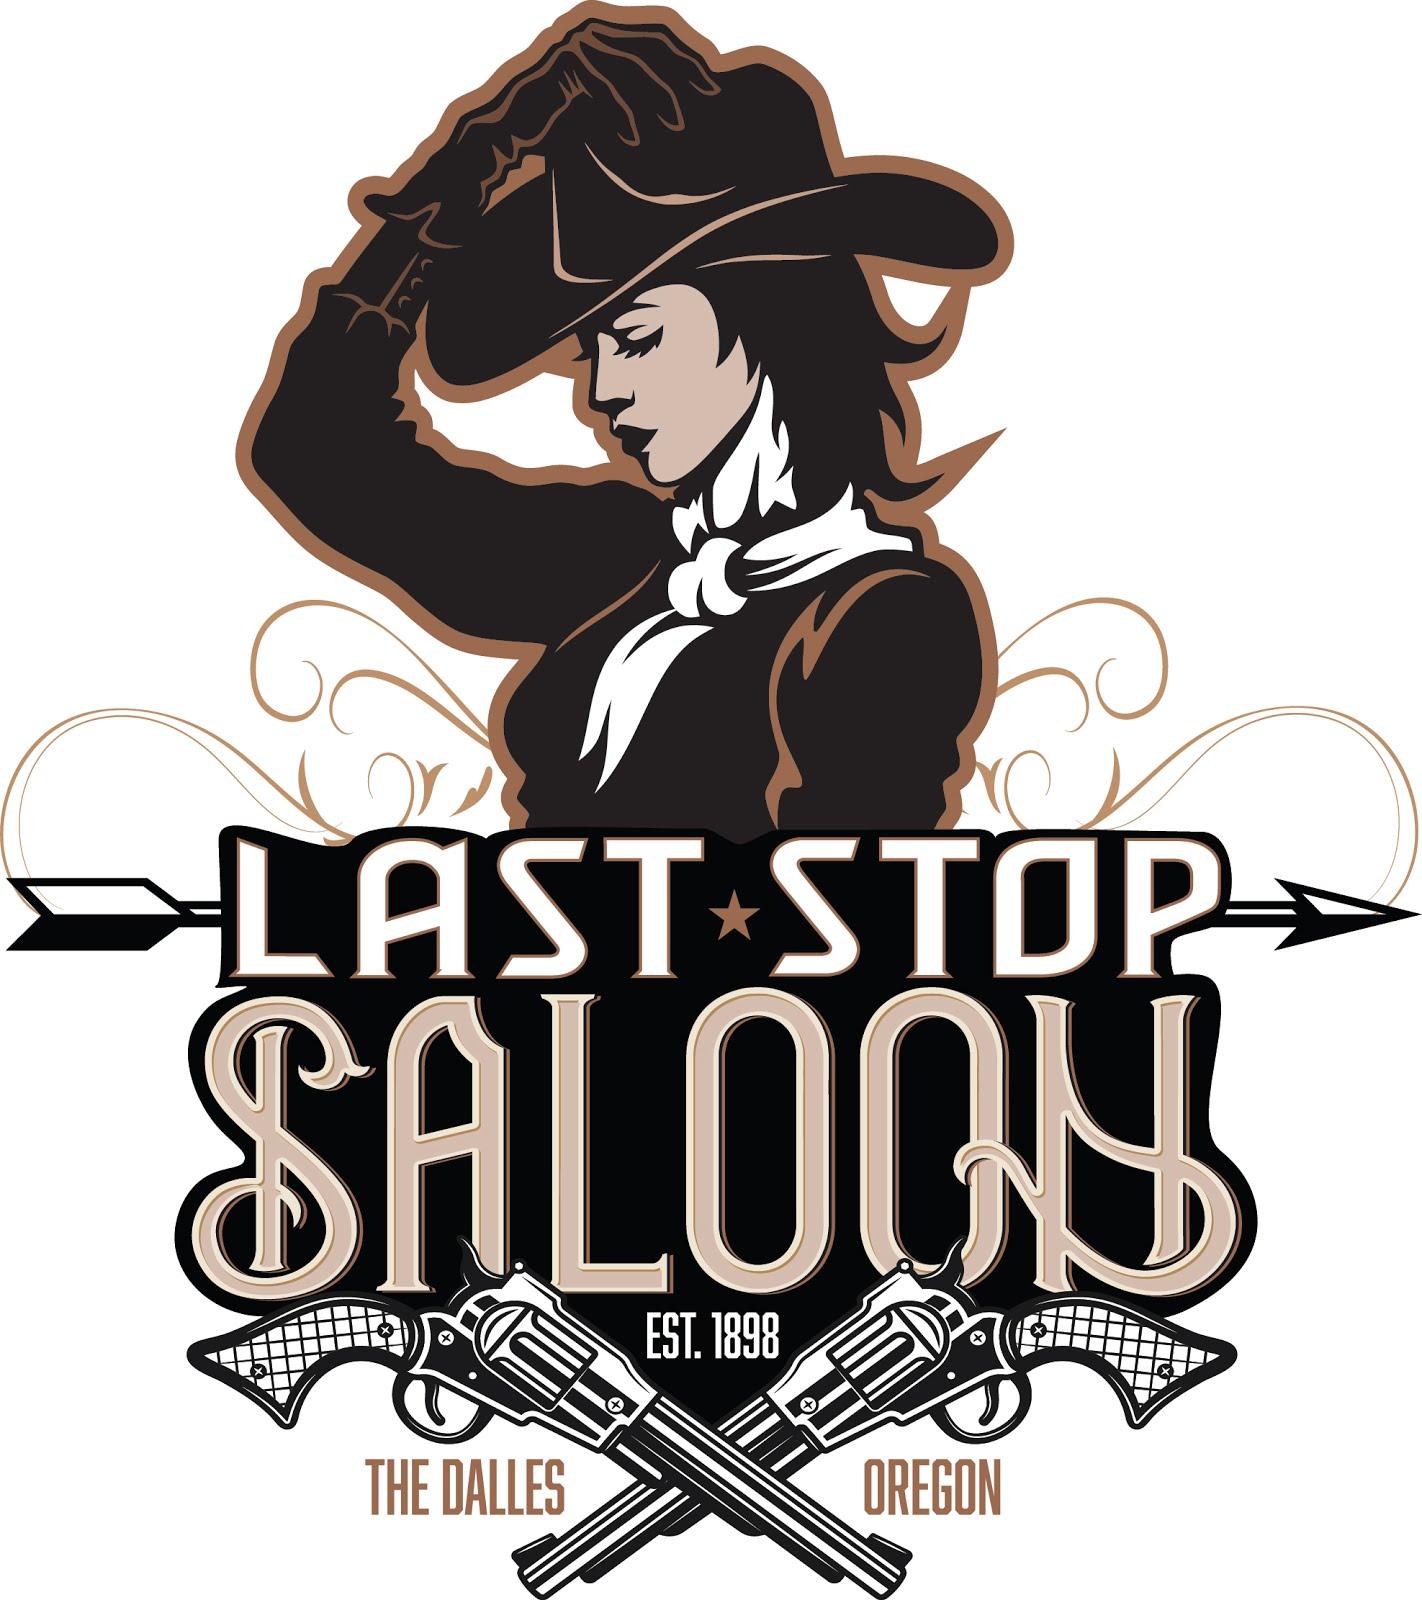 Last Stop Saloon